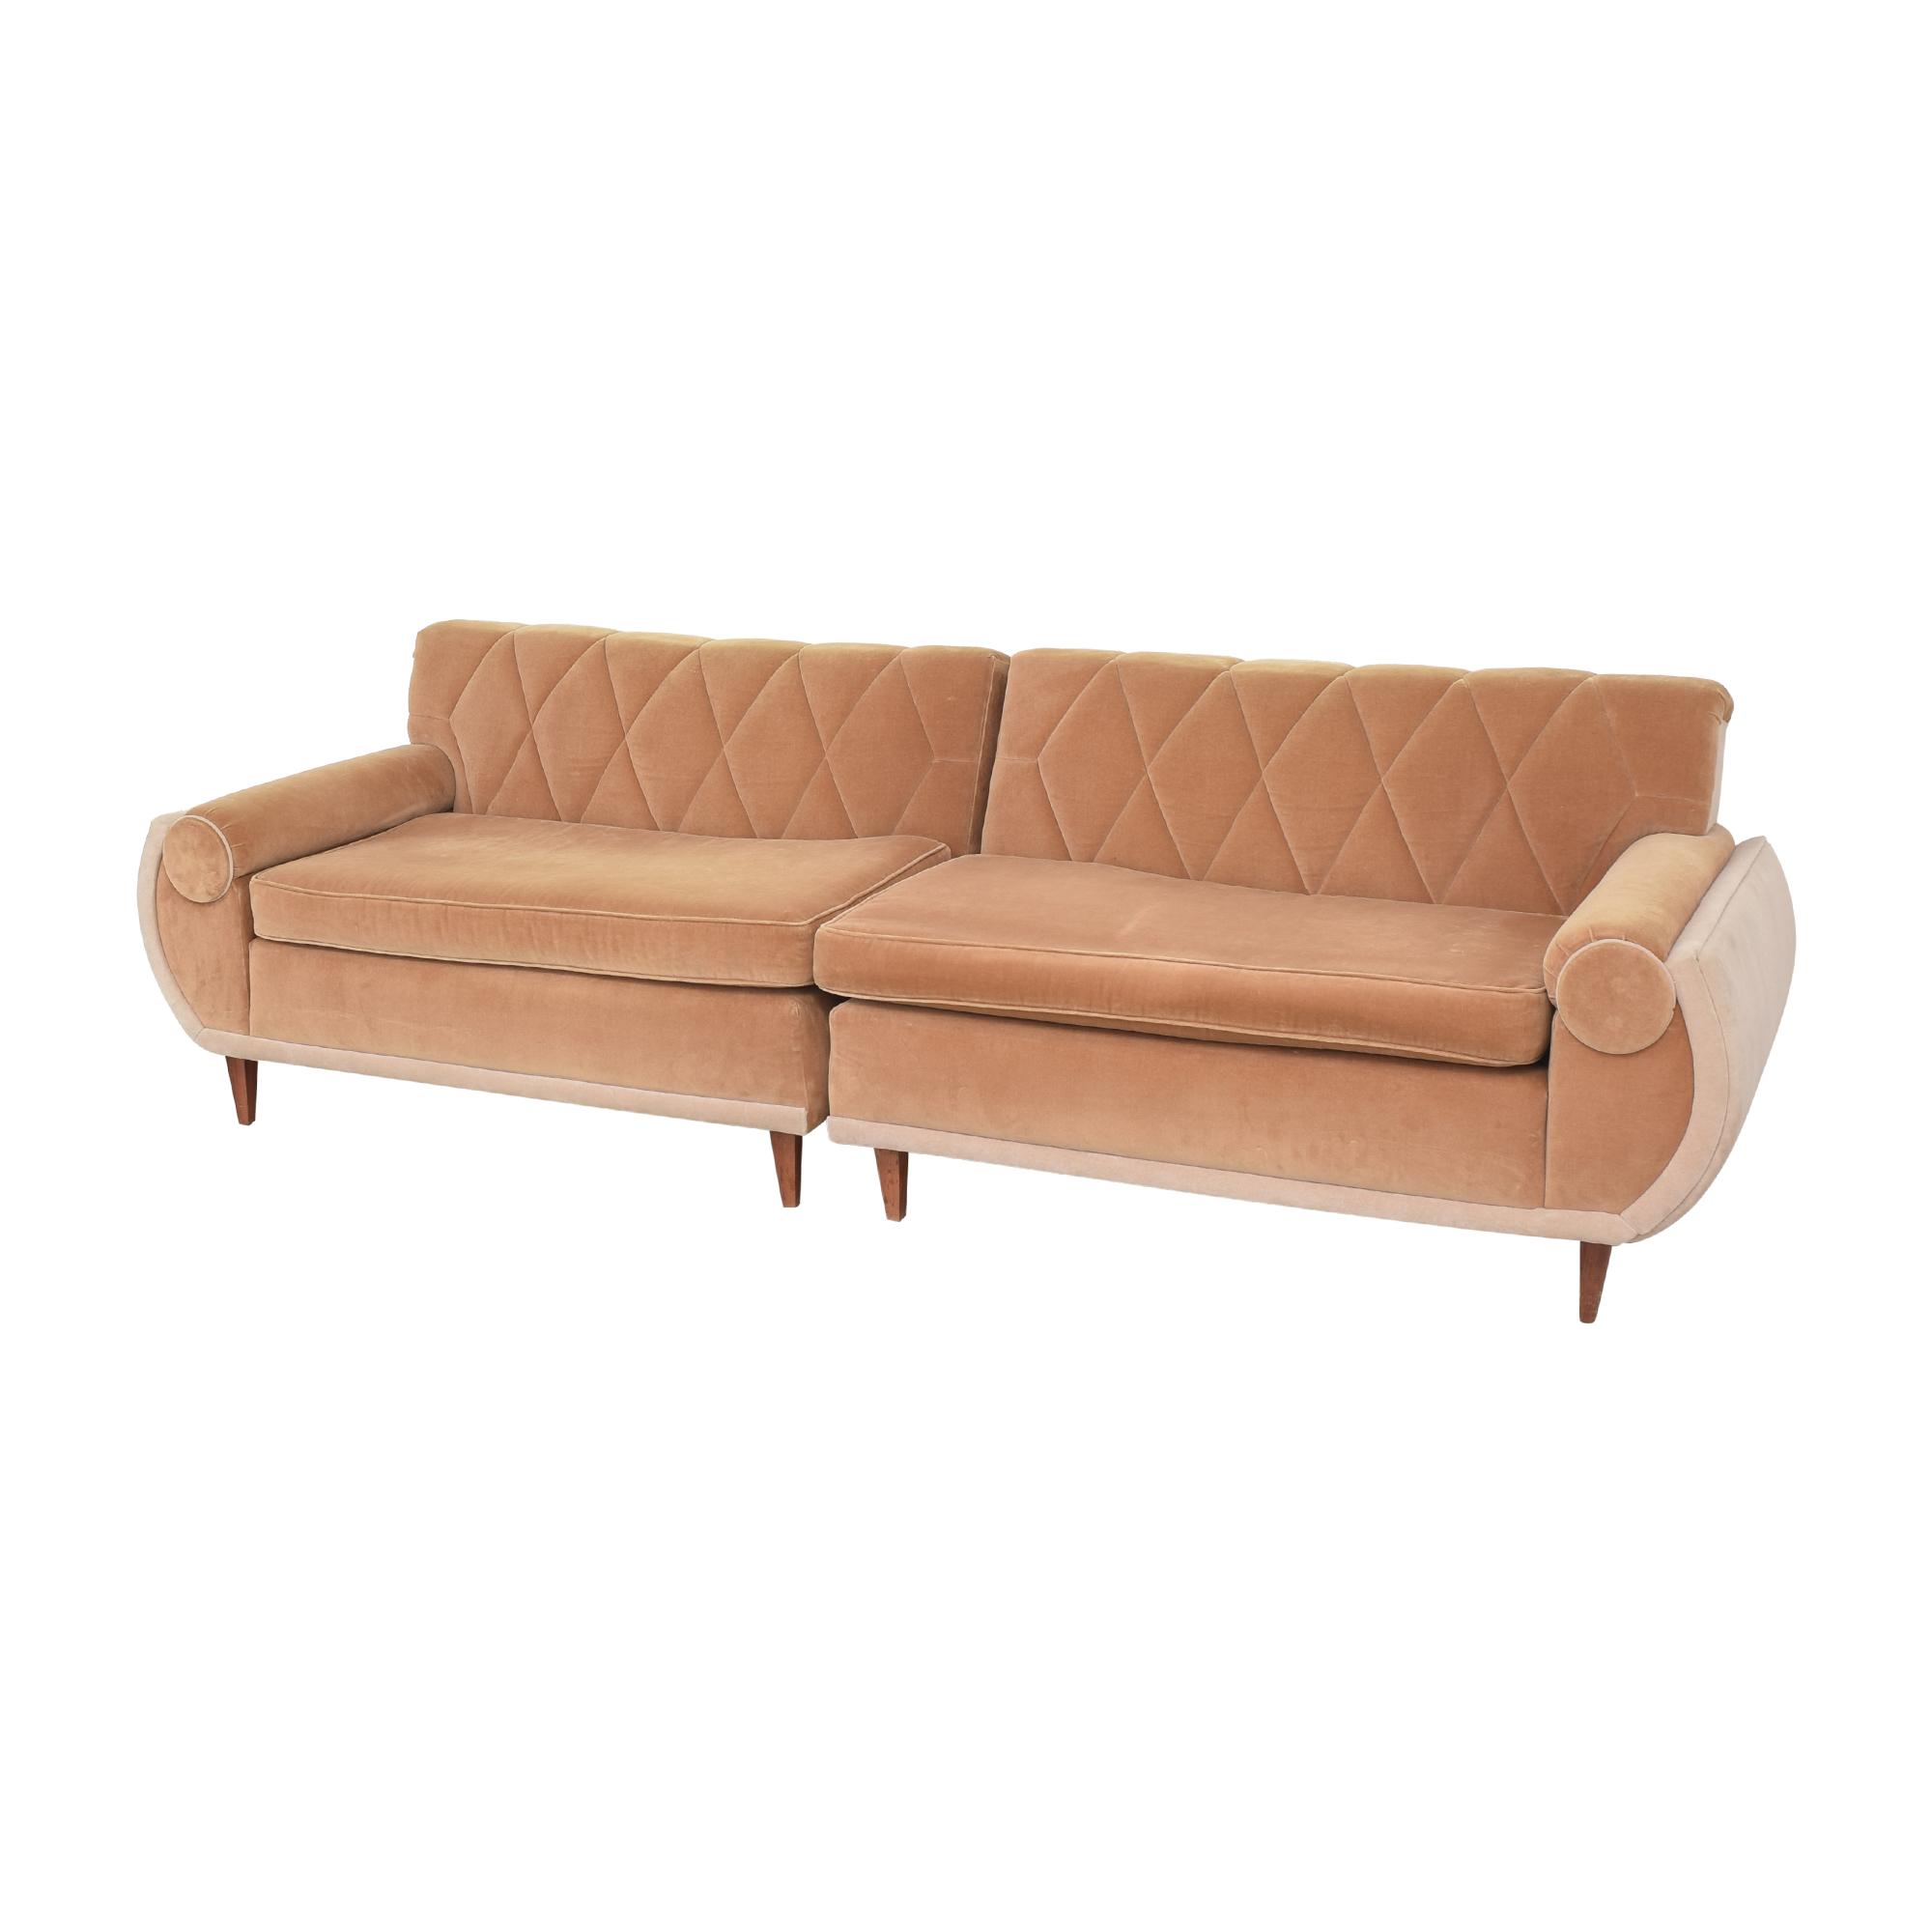 Art Deco Sectional Sofa nj